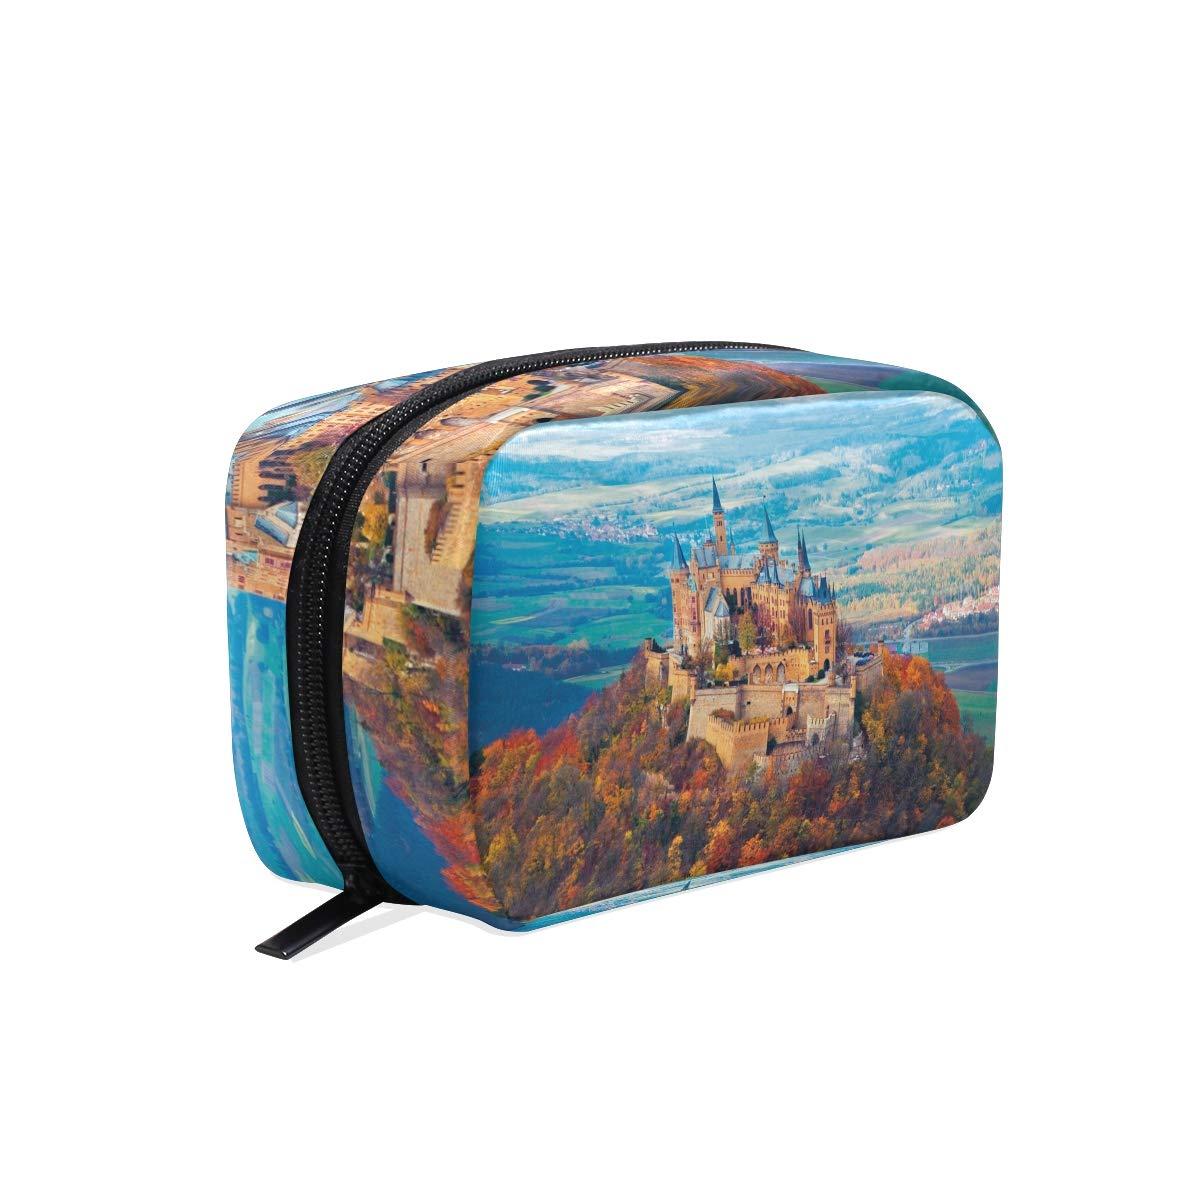 Makeup Organizer Neuschwanstein Castle Autumn Womens Zip Toiletry Bag Large Case Cosmetic Bags